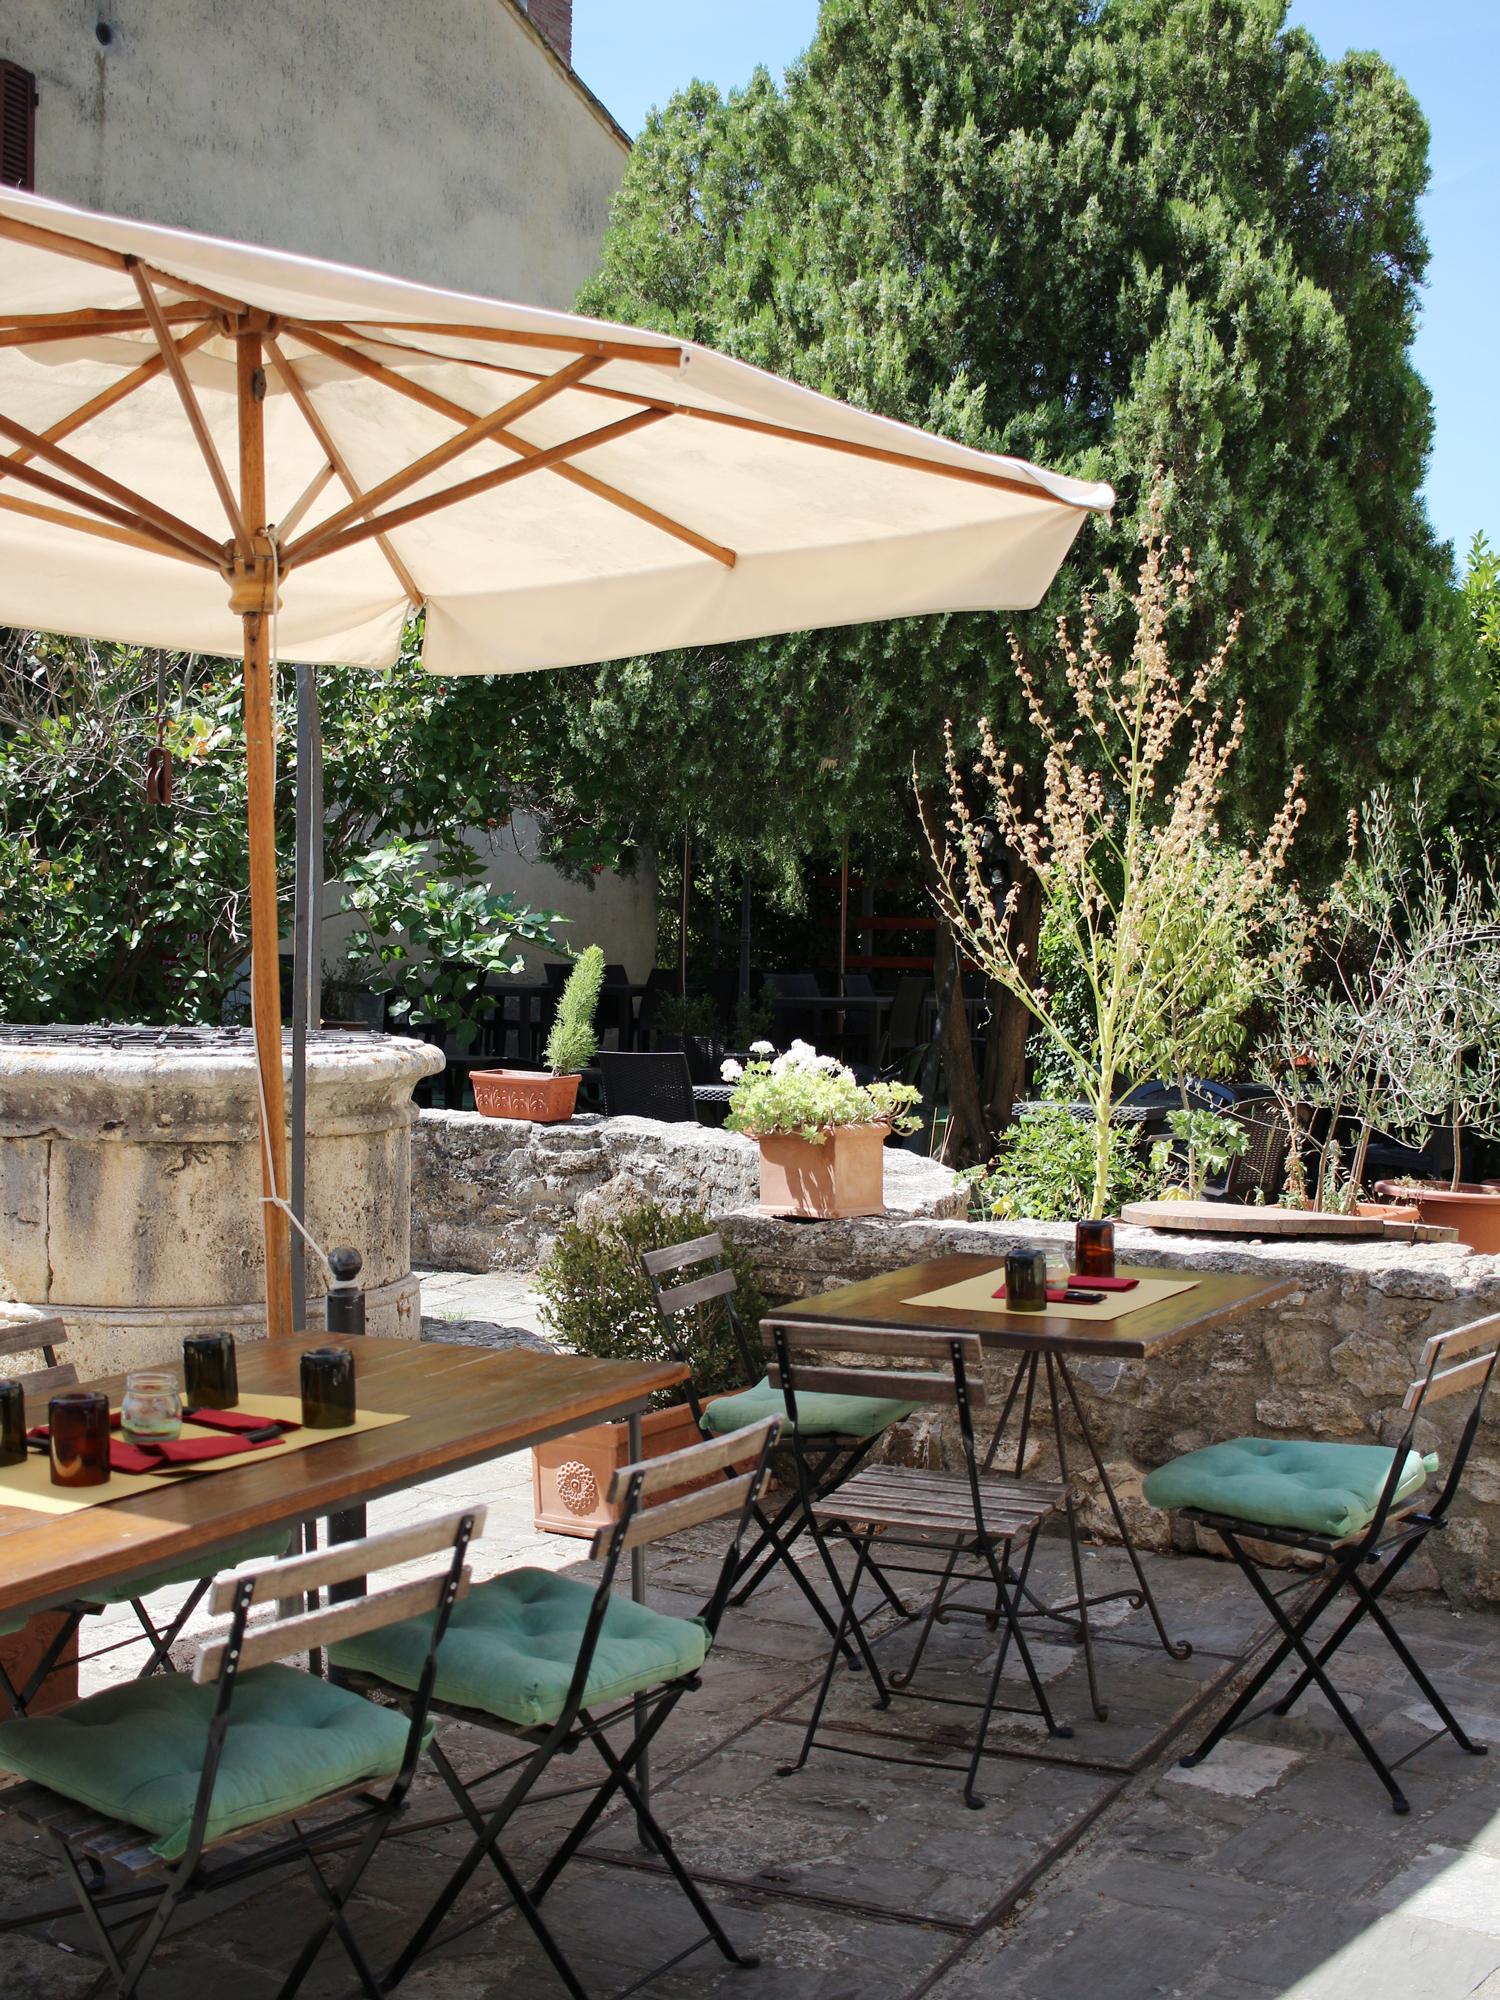 tuscany-bagno-vignoni-italy-travel-blogger-6